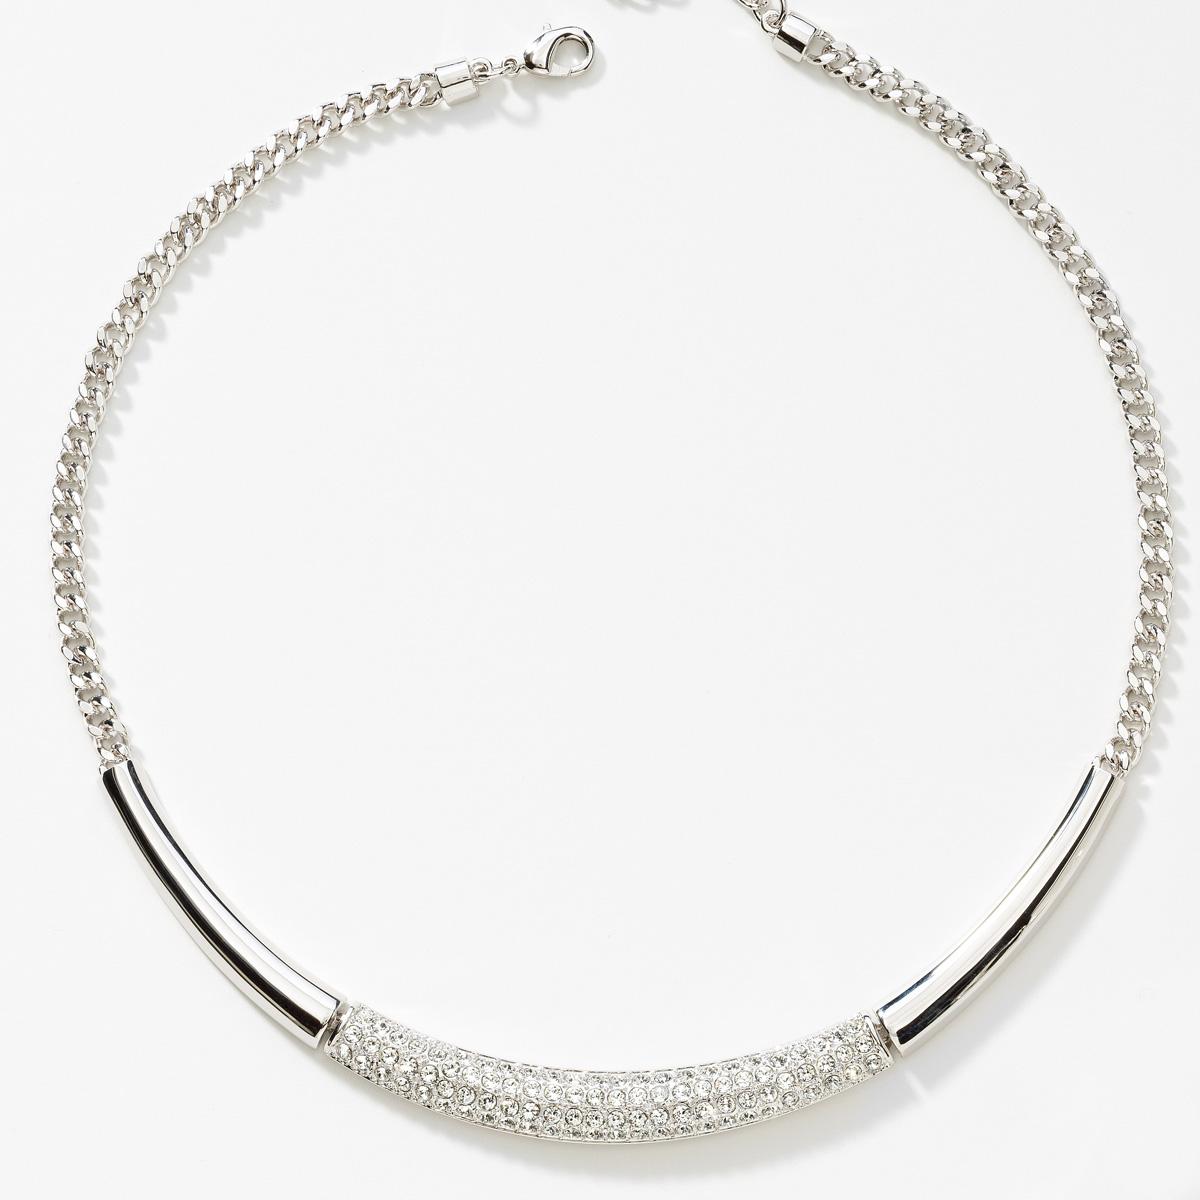 7903997de34be2 Touchstone Crystal by Swarovski – Jewelry Home Parties